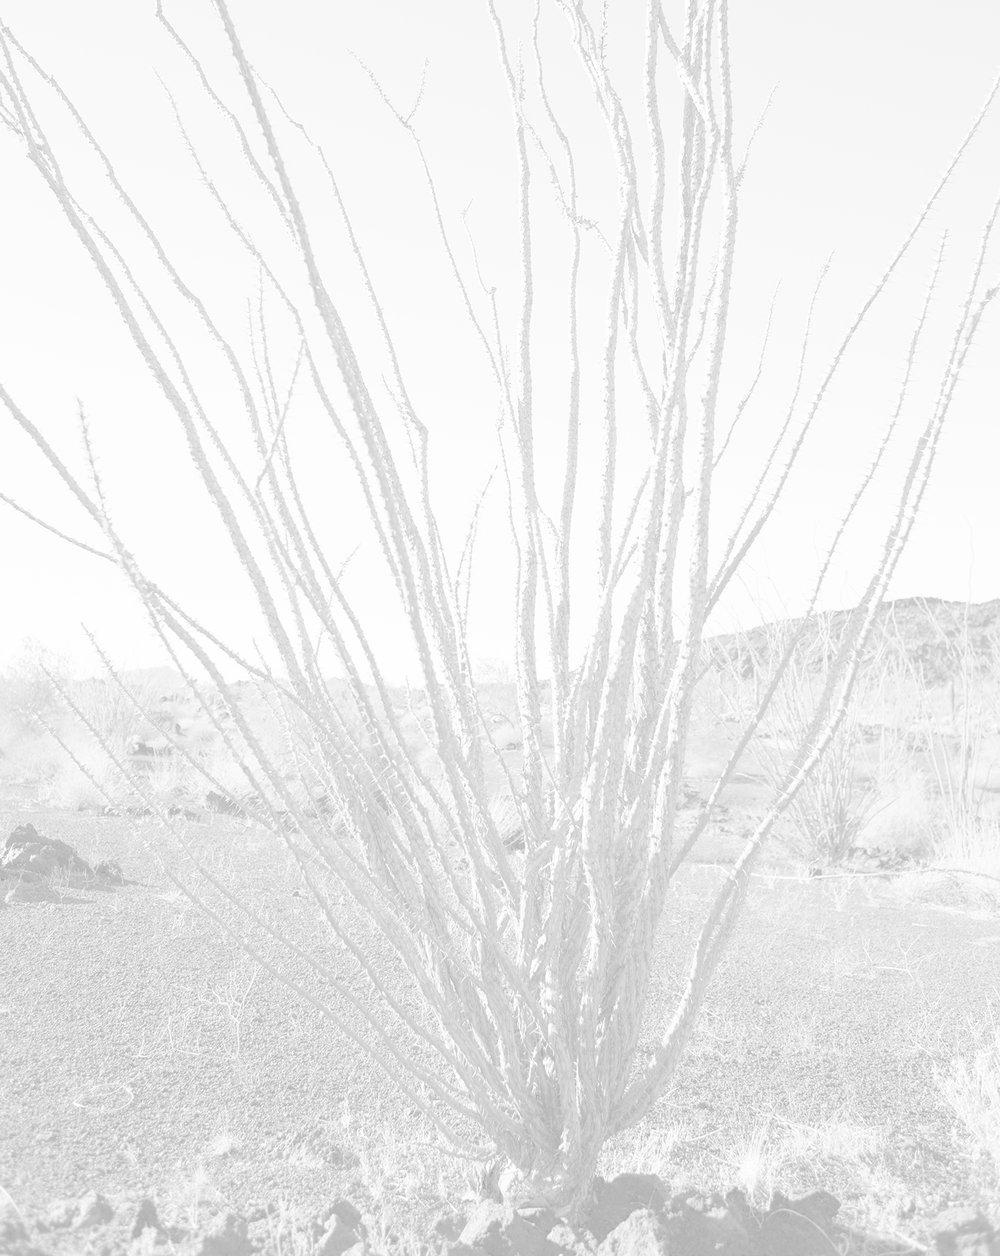 scott b. davis  ocotillo, ocotillo (no. 17) , 2015/2016 palladium print 20 x 16 inches edition 1/5